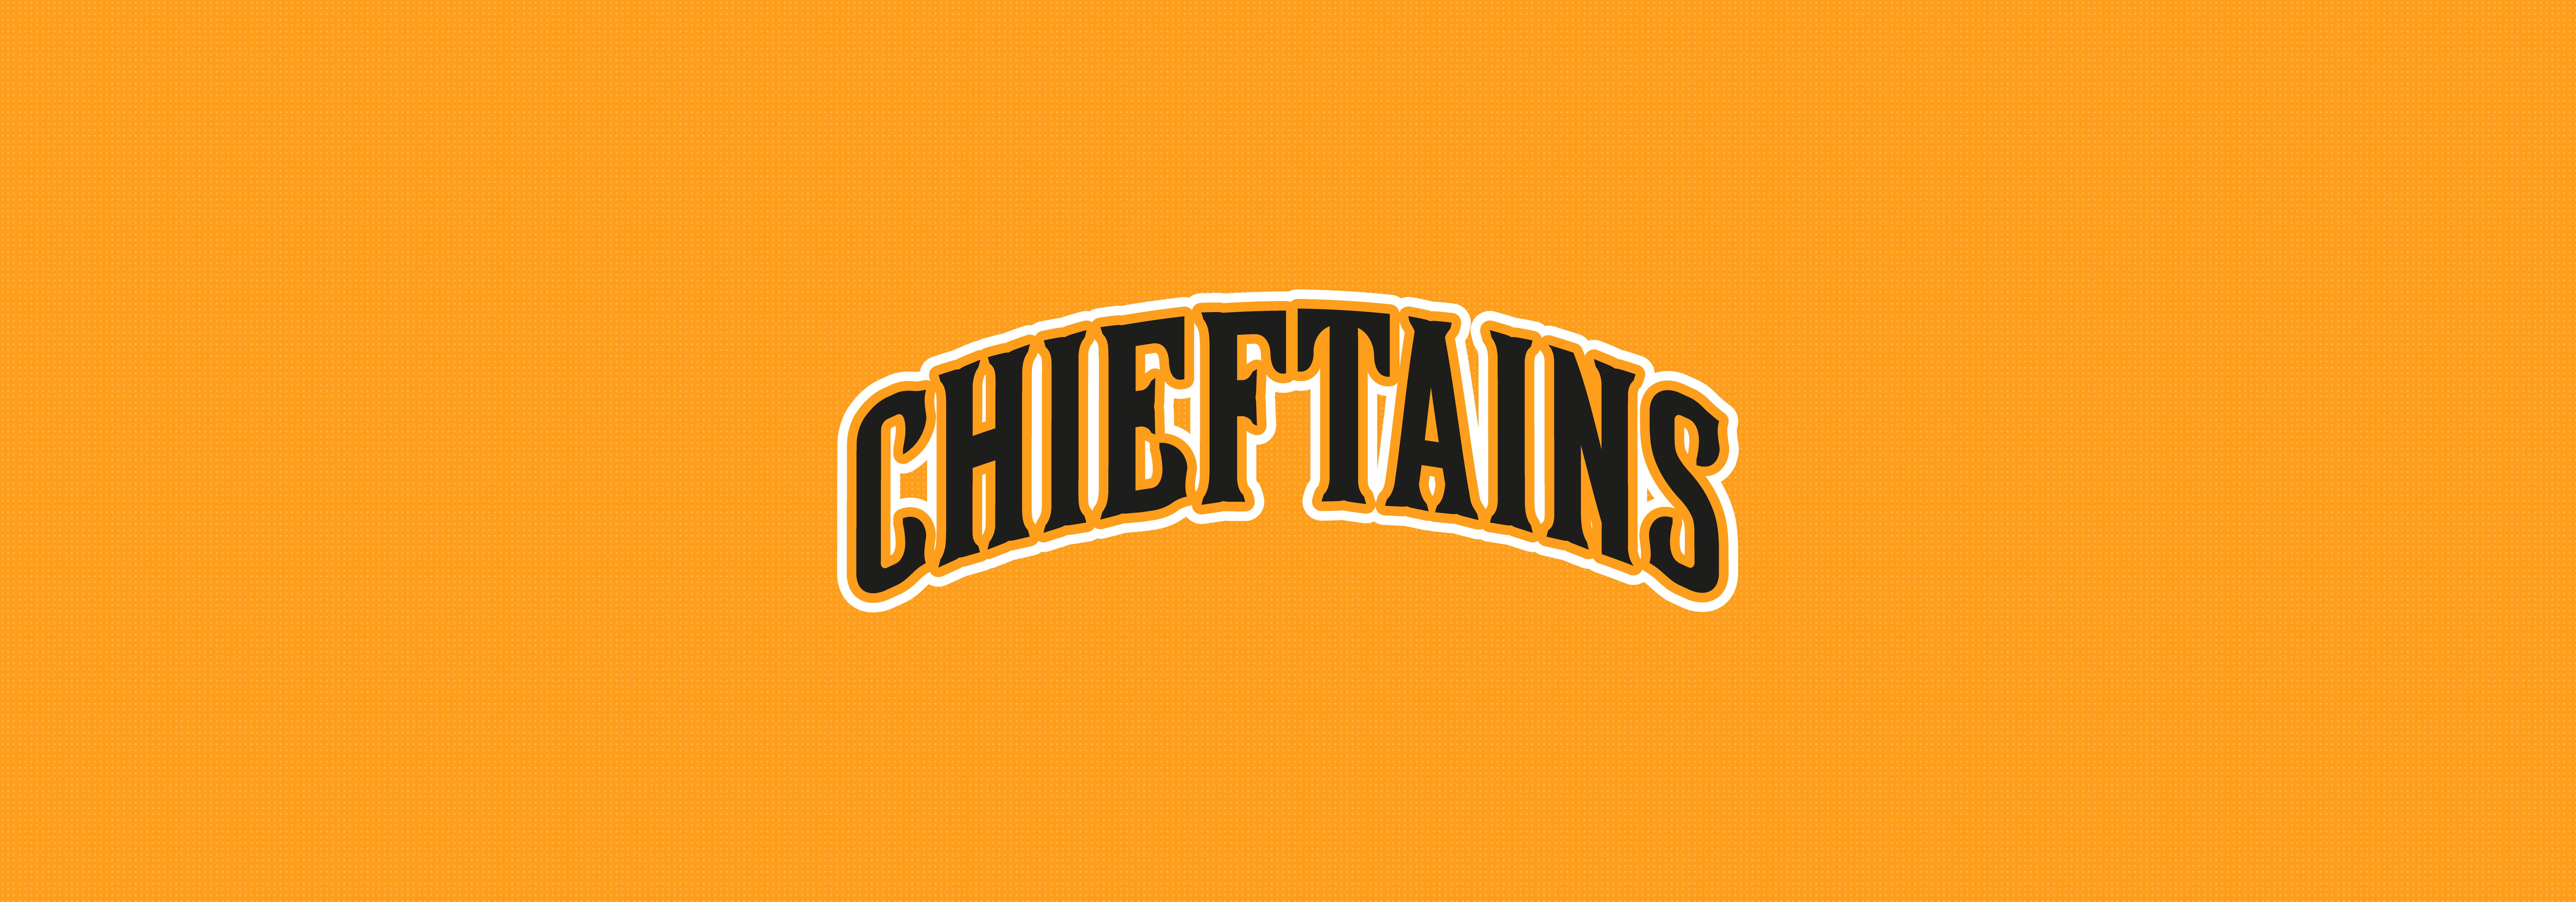 Chelmsford Chieftains Alternate Jersey